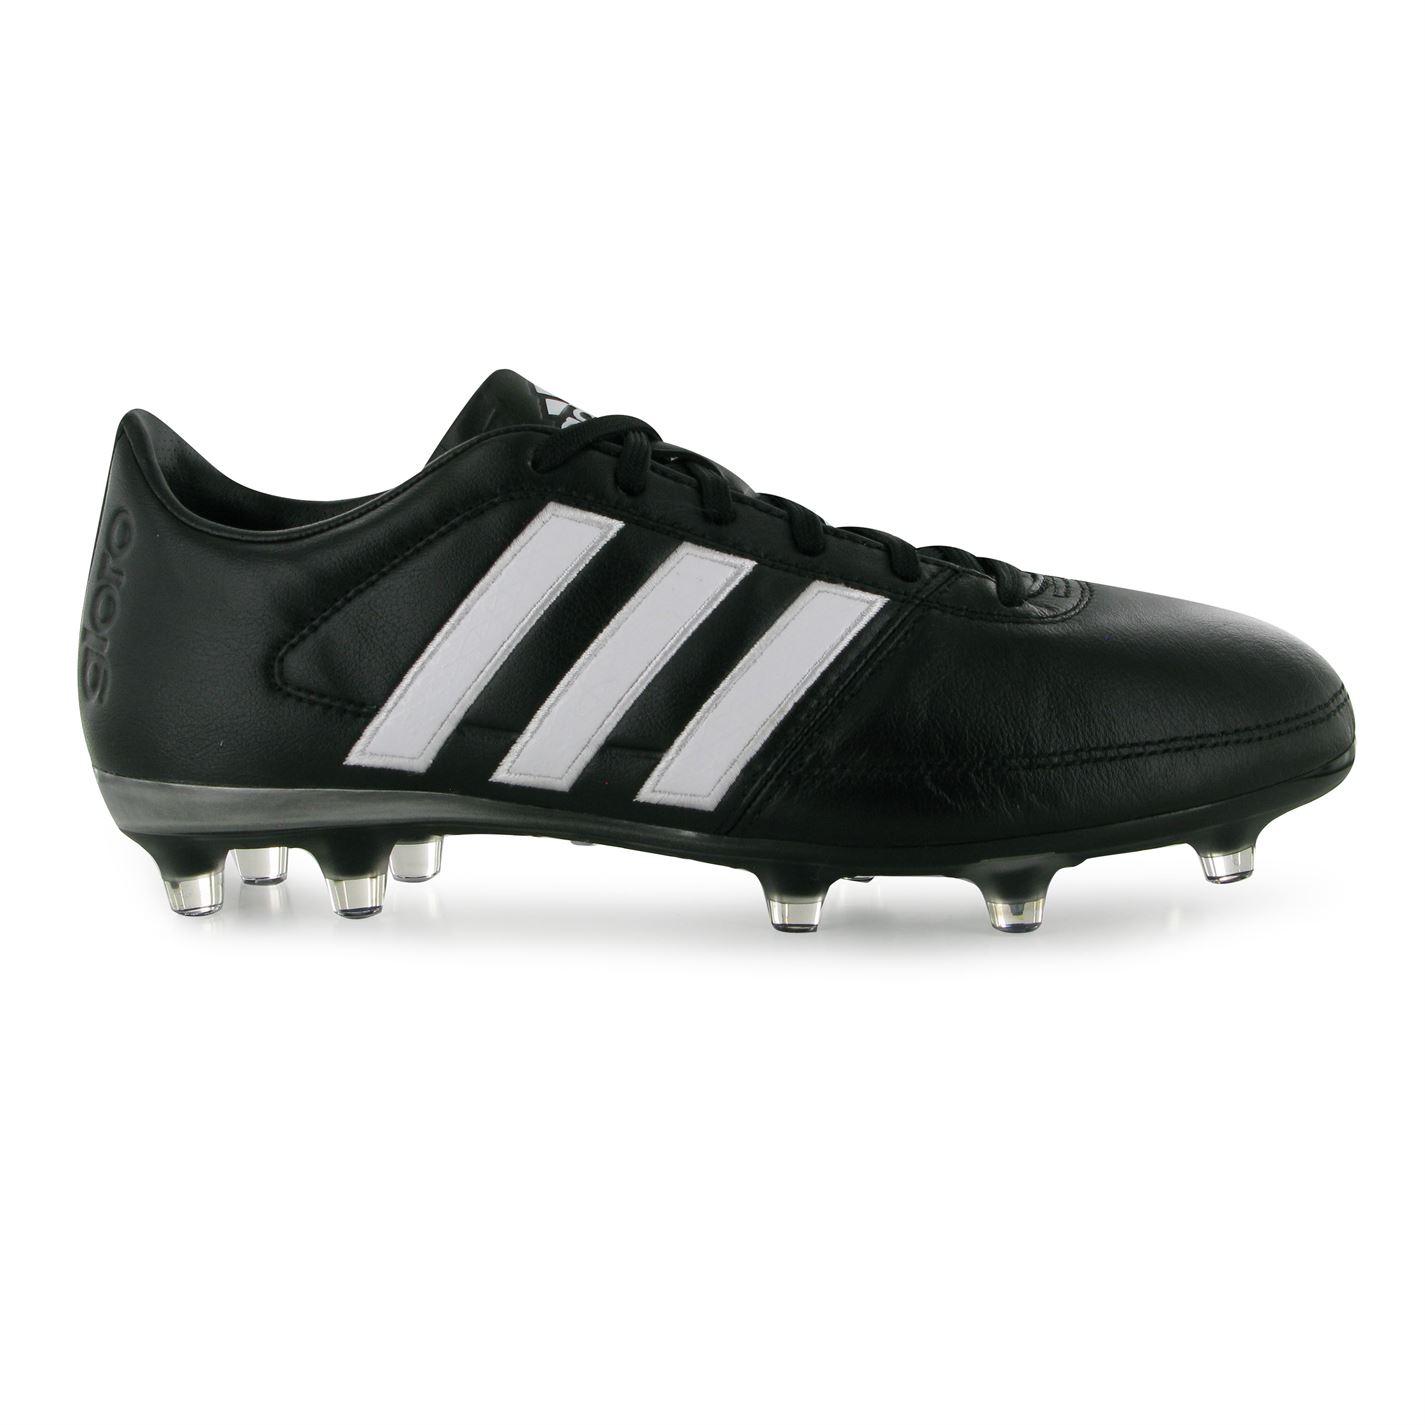 Adidas Gloro 16.1 FG Mens Football Boots